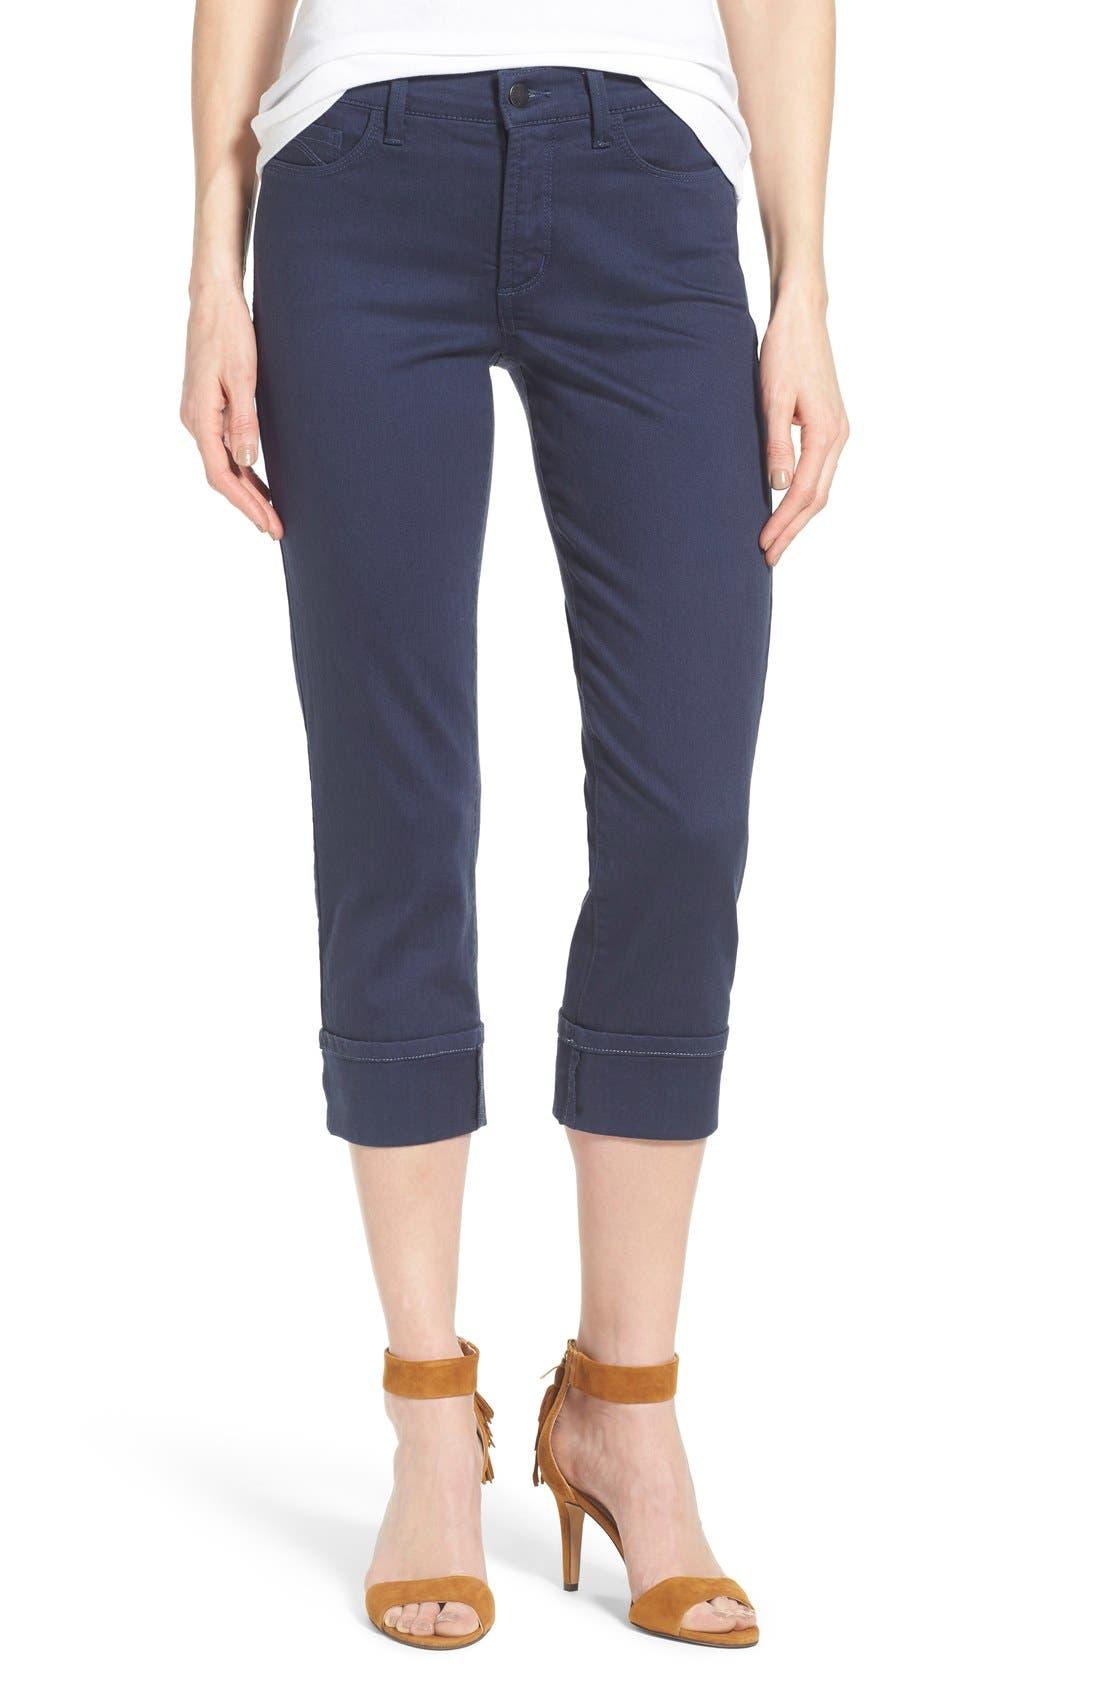 'Dayla' Colored Wide Cuff Capri Jeans,                             Main thumbnail 7, color,